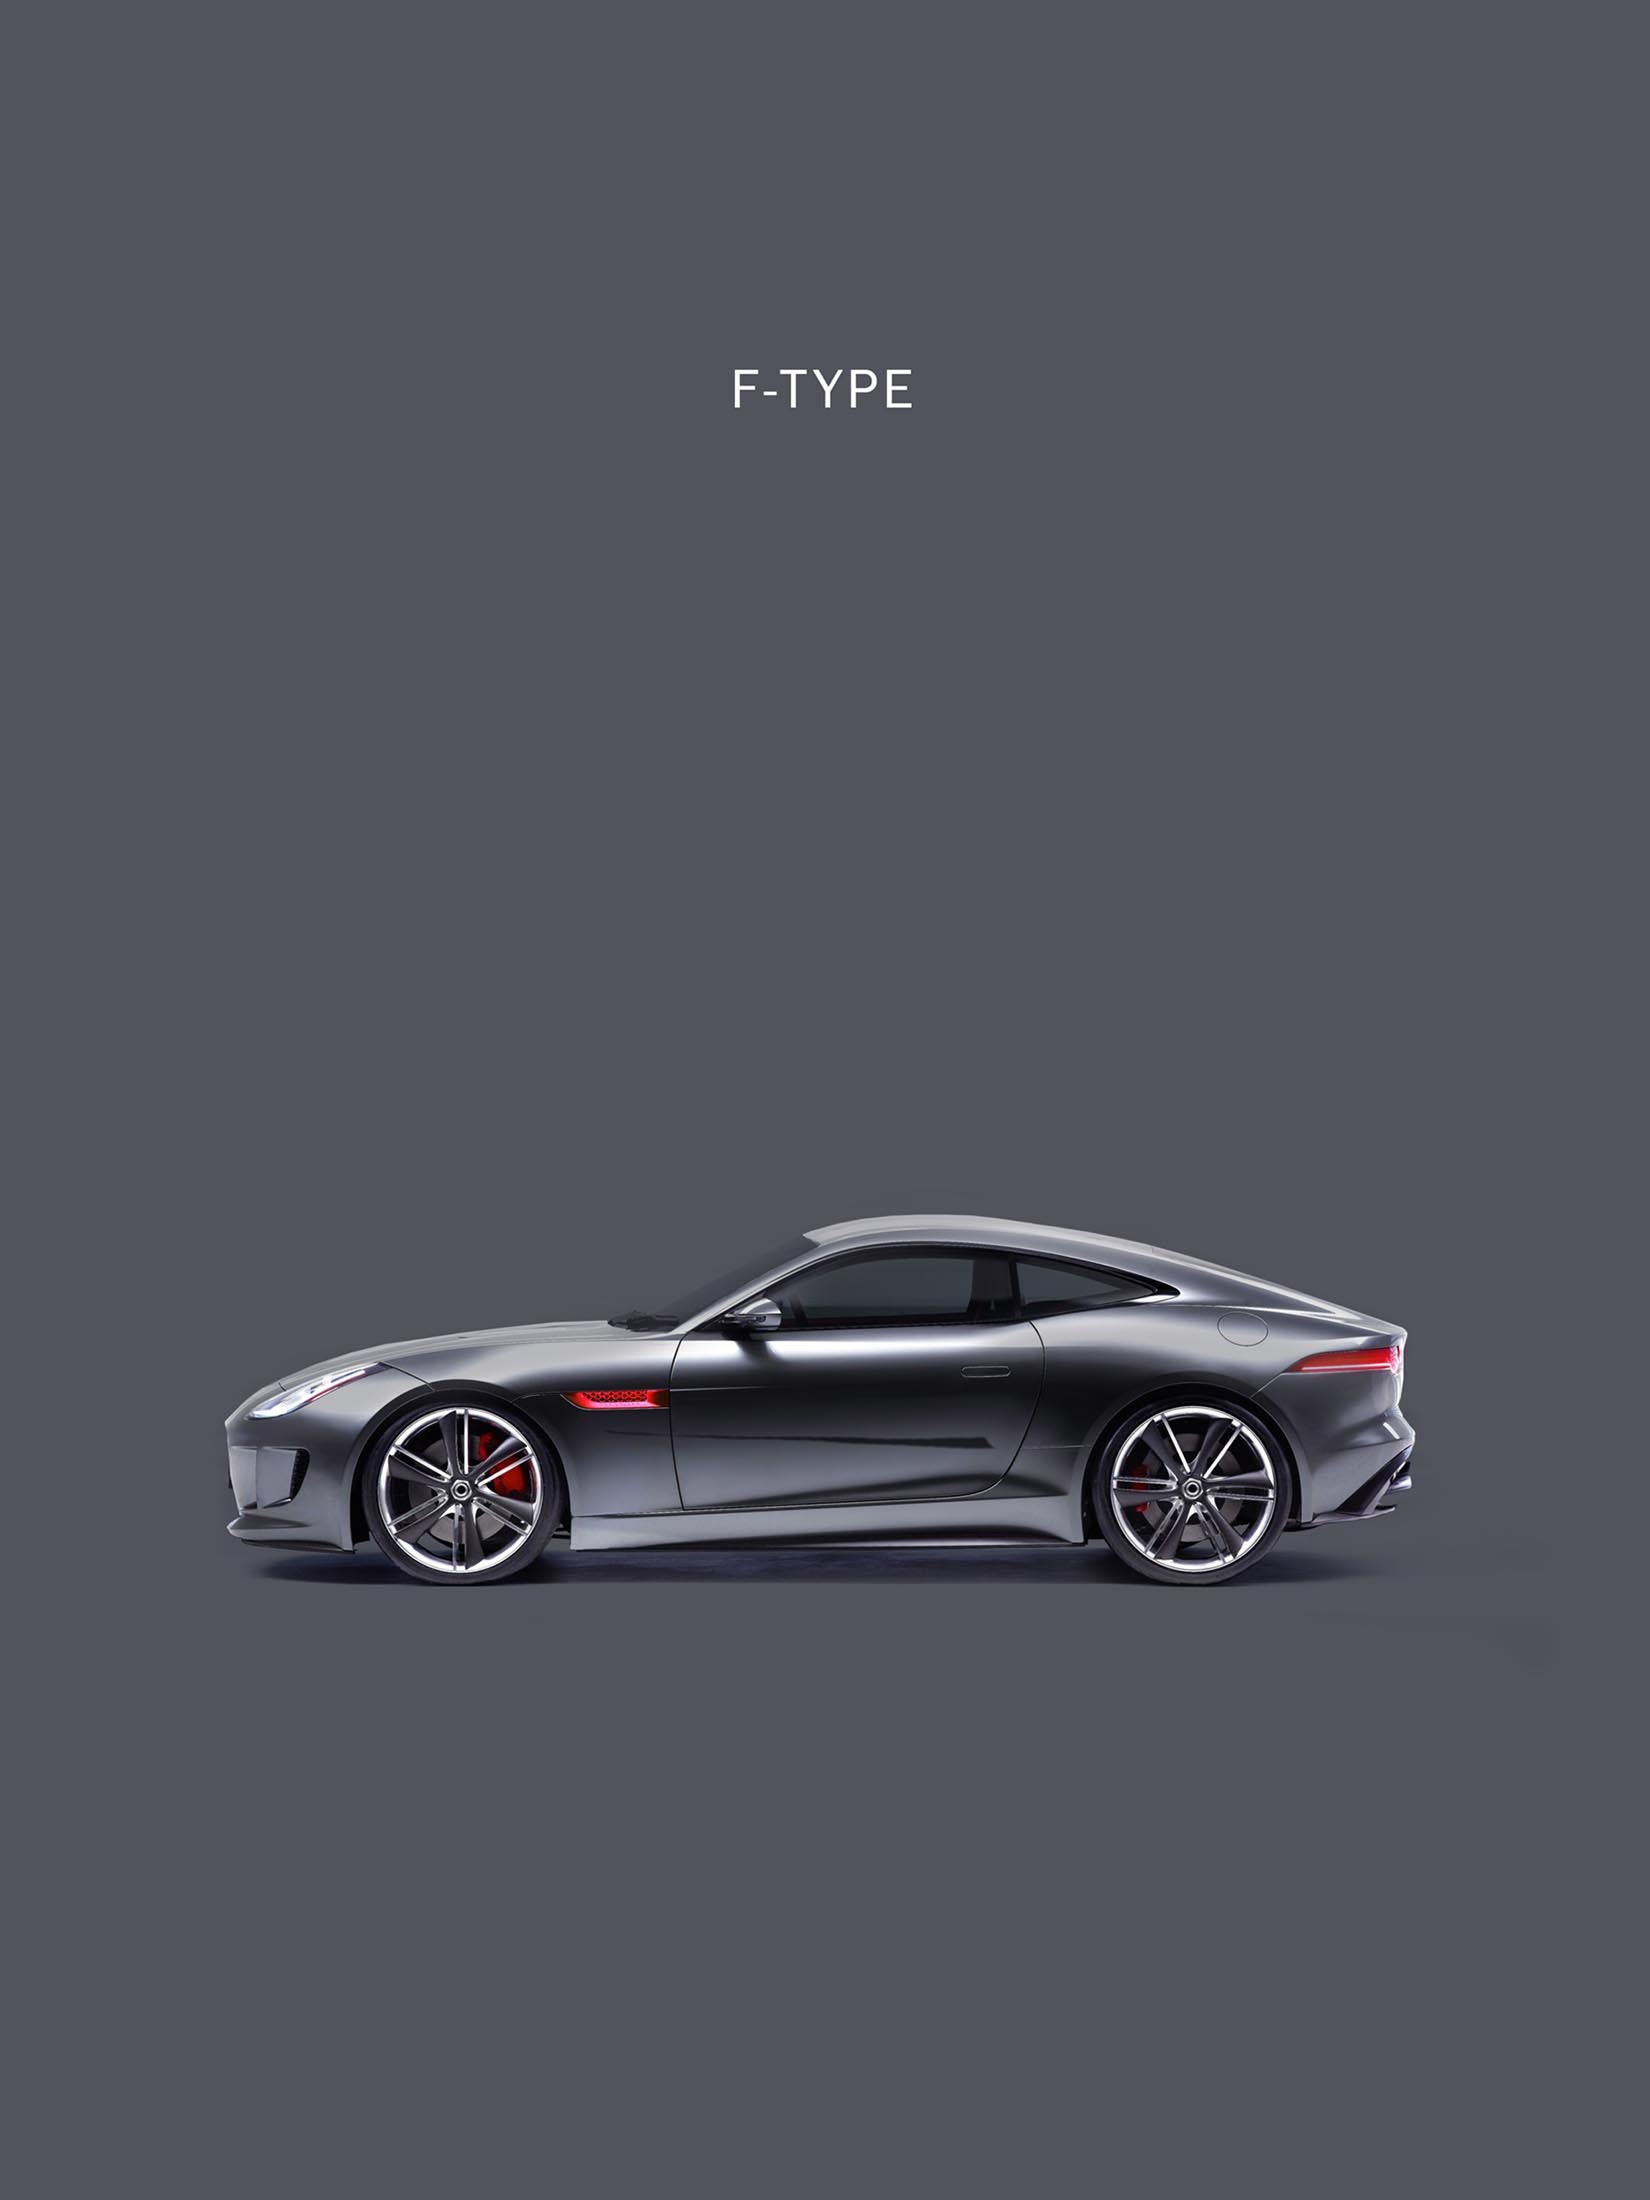 F-type